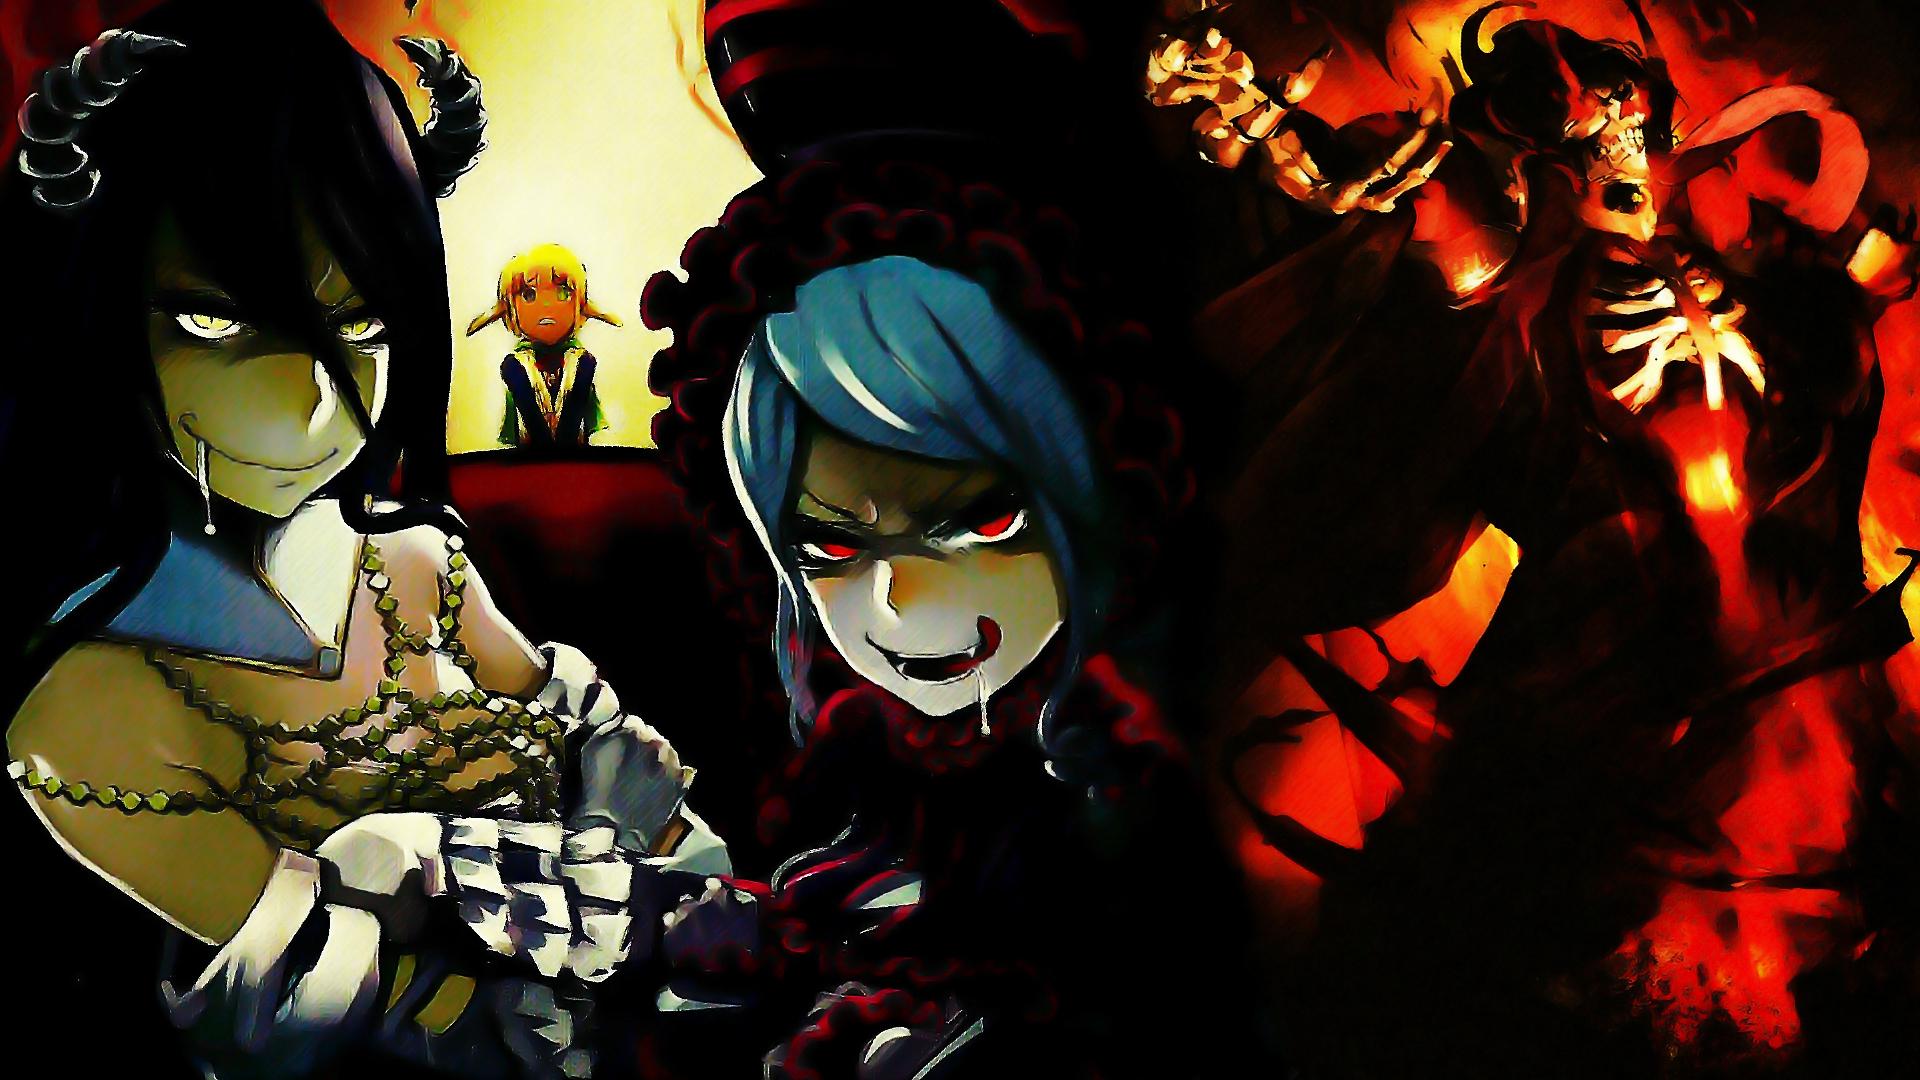 Ainz Ooal Gown Albedo Overlord Overlord Anime Shalltear Bloodfallen 1920x1080